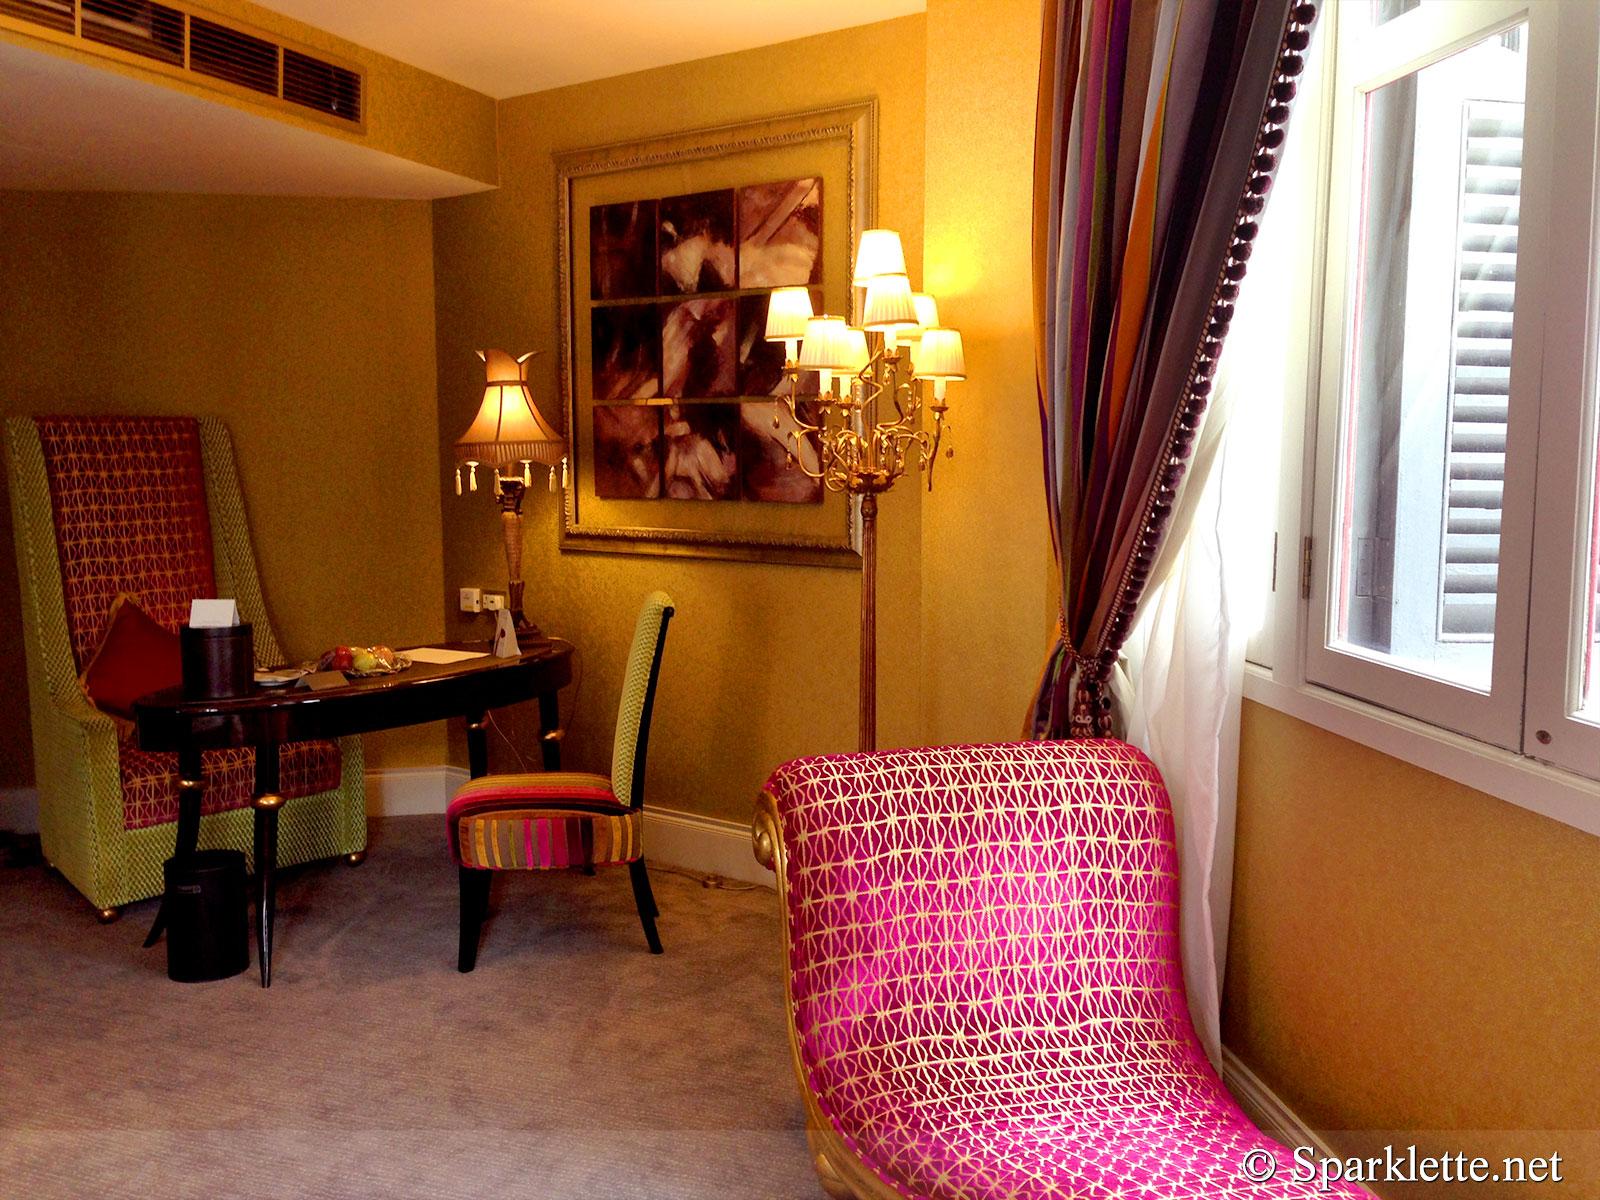 The Scarlet Hotel Splendour Suite Living Room